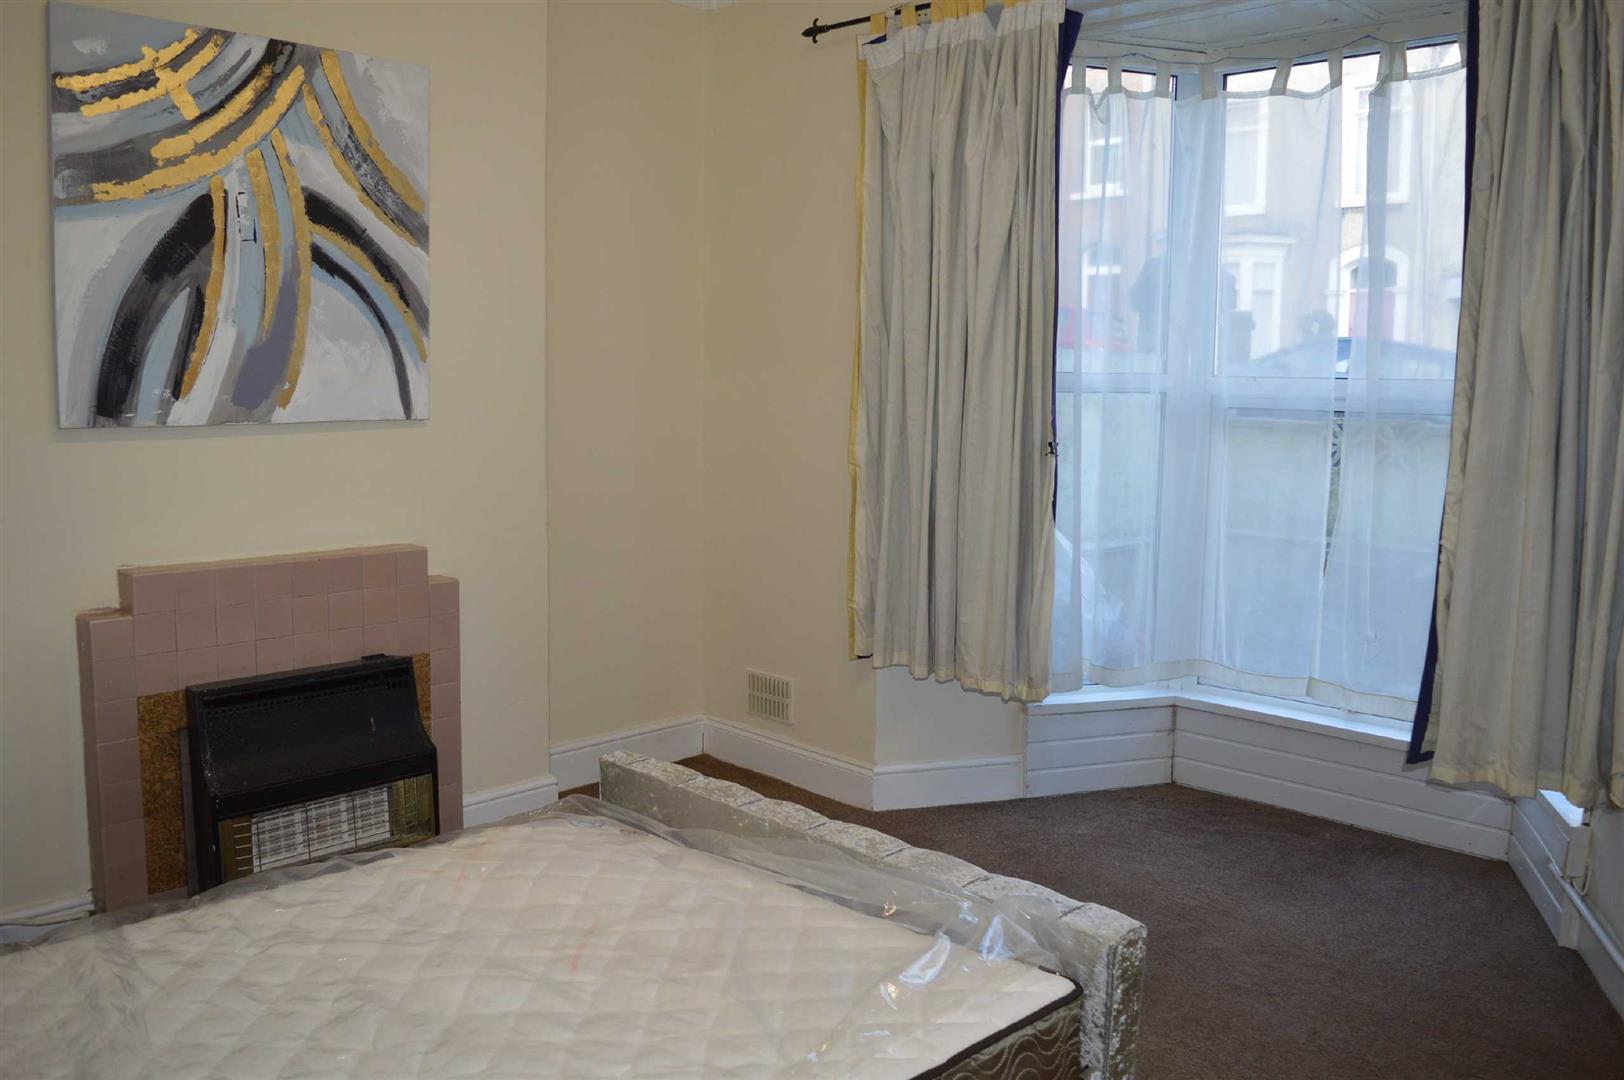 Finsbury Terrace, Brynmill, Swansea, SA2 0AH